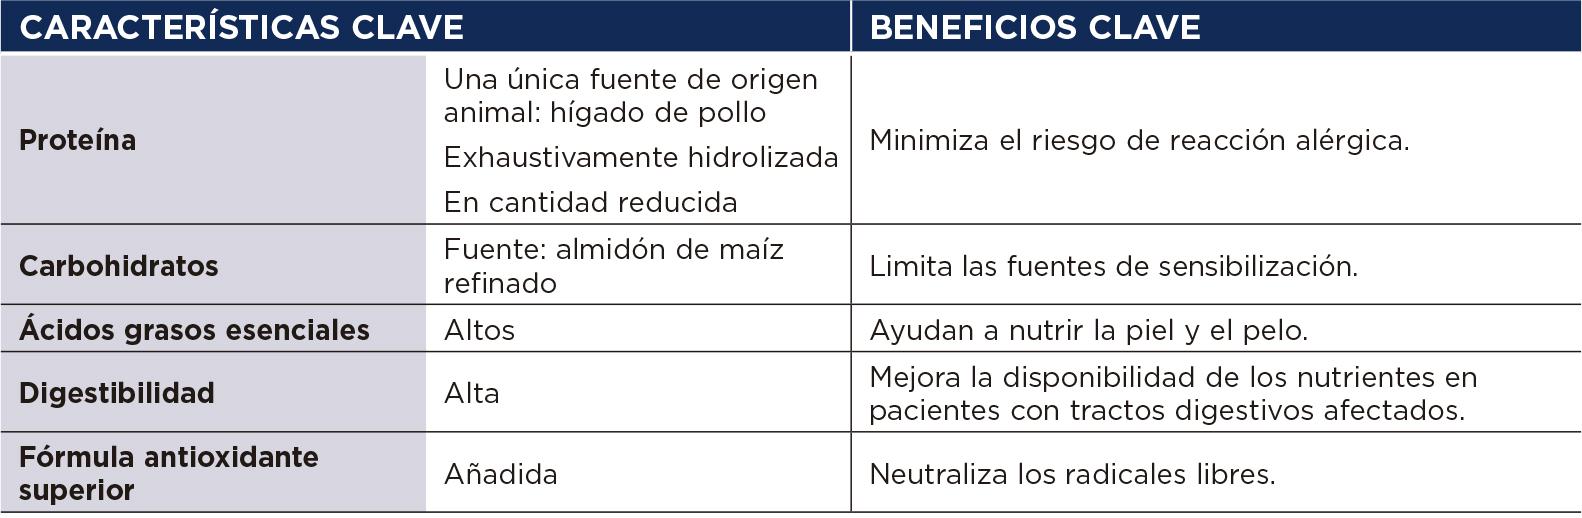 Hills prescription diet hypoallergenic treats  beneficios clave